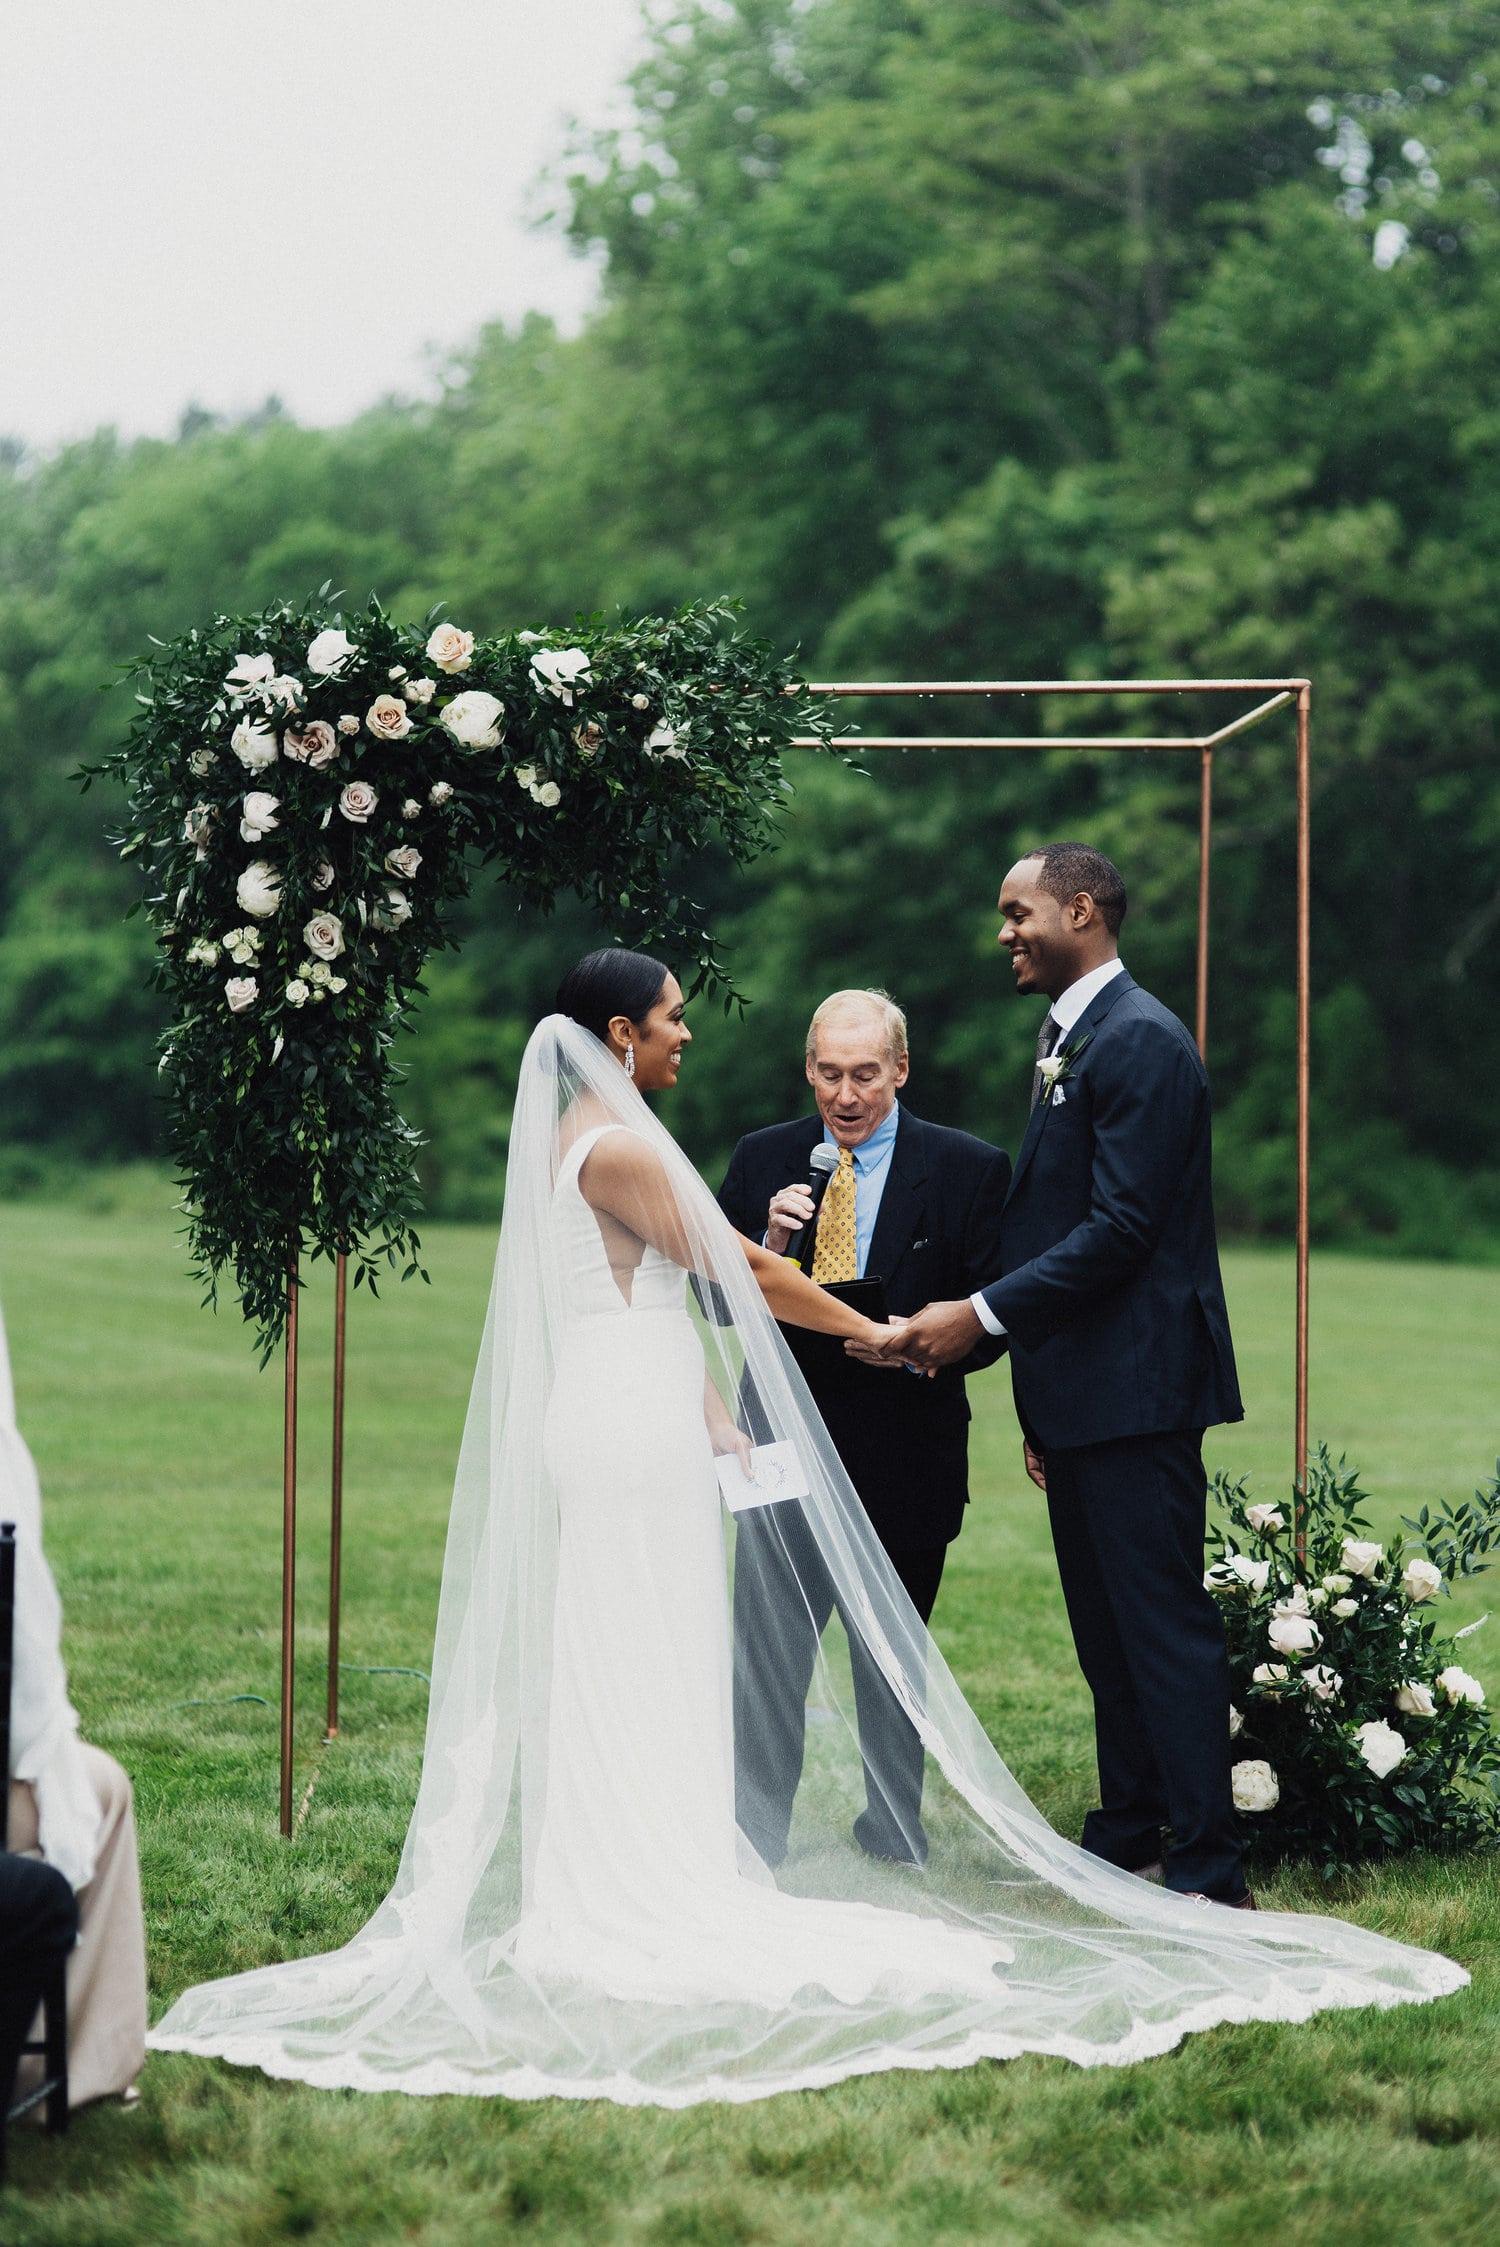 haynes-wedding-edenstraderphoto-318-min.jpg